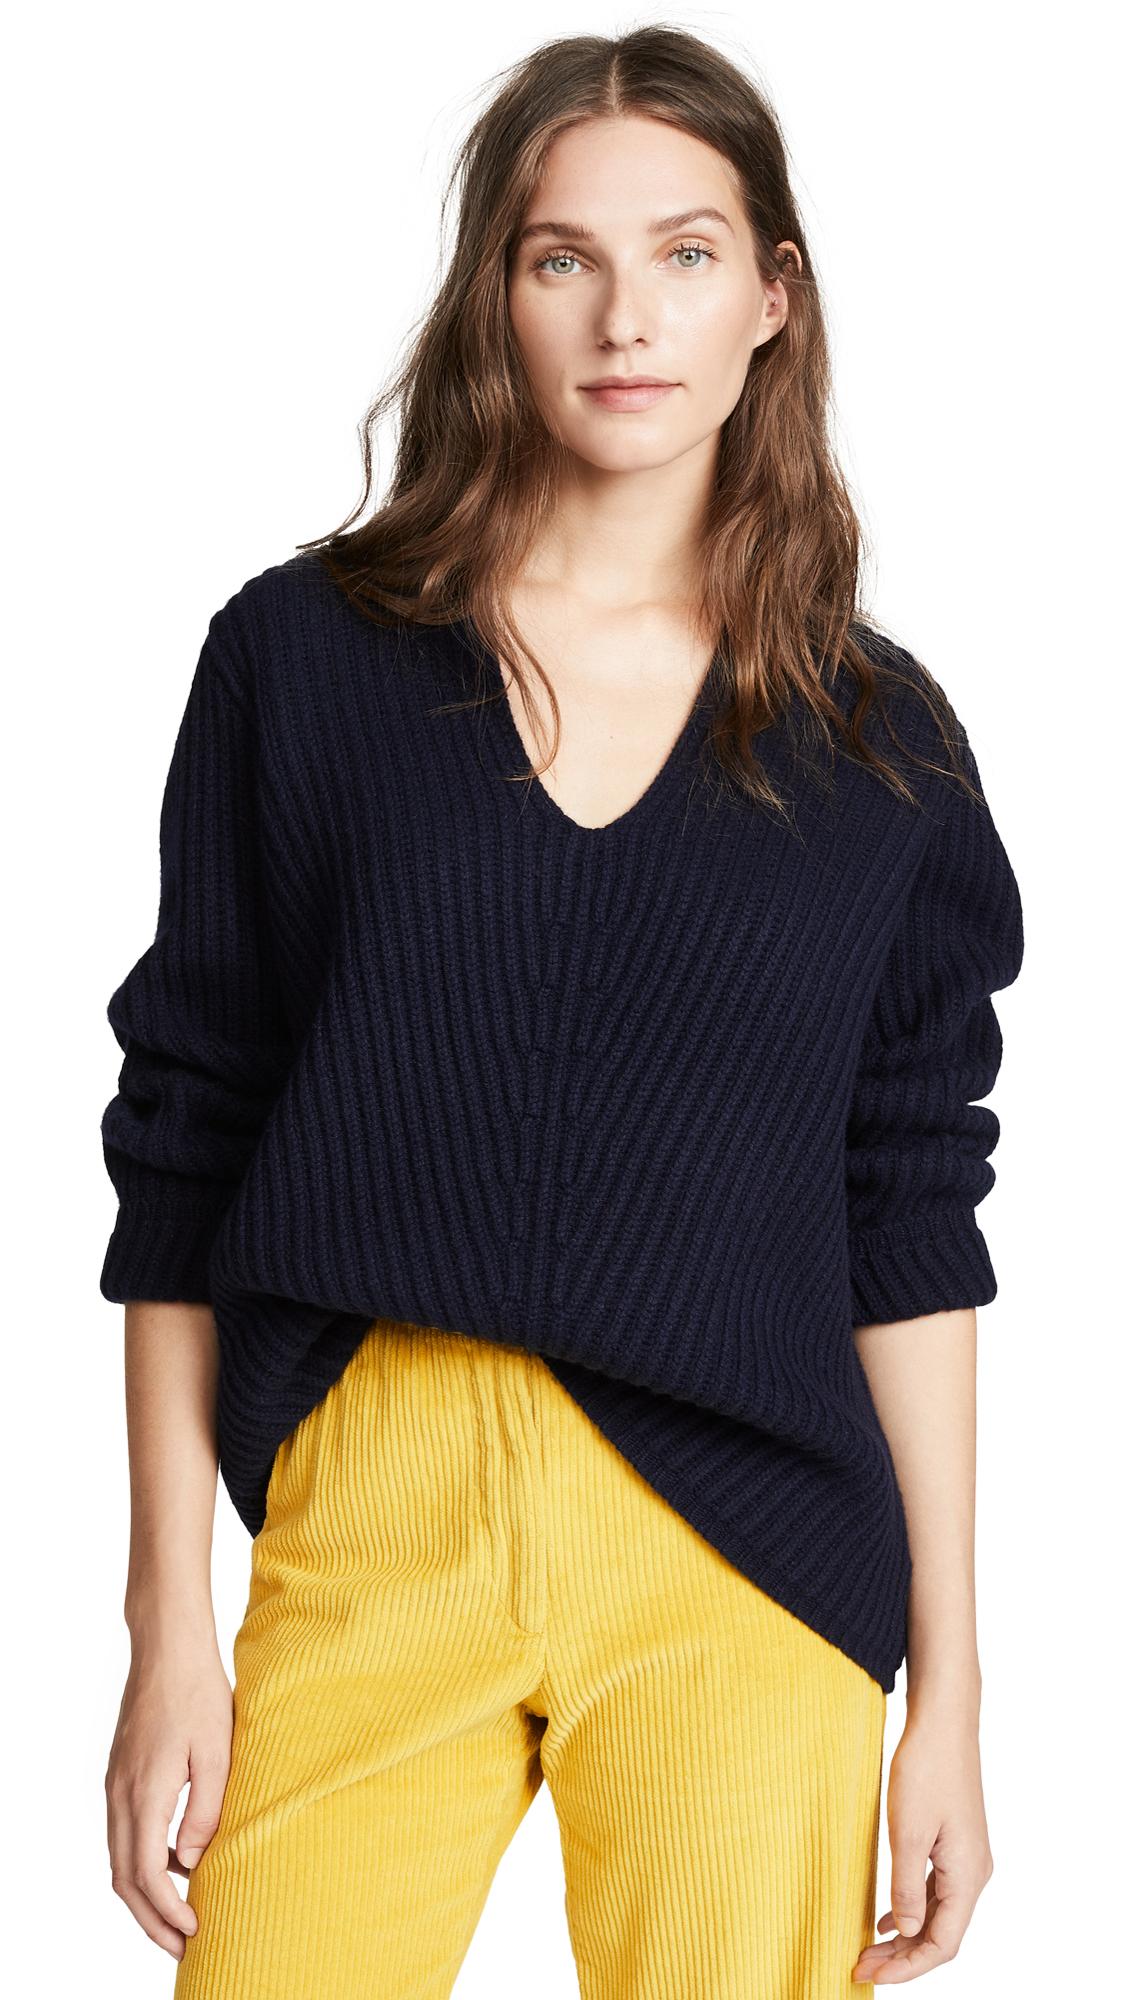 Acne Studios Deborah Sweater In Navy